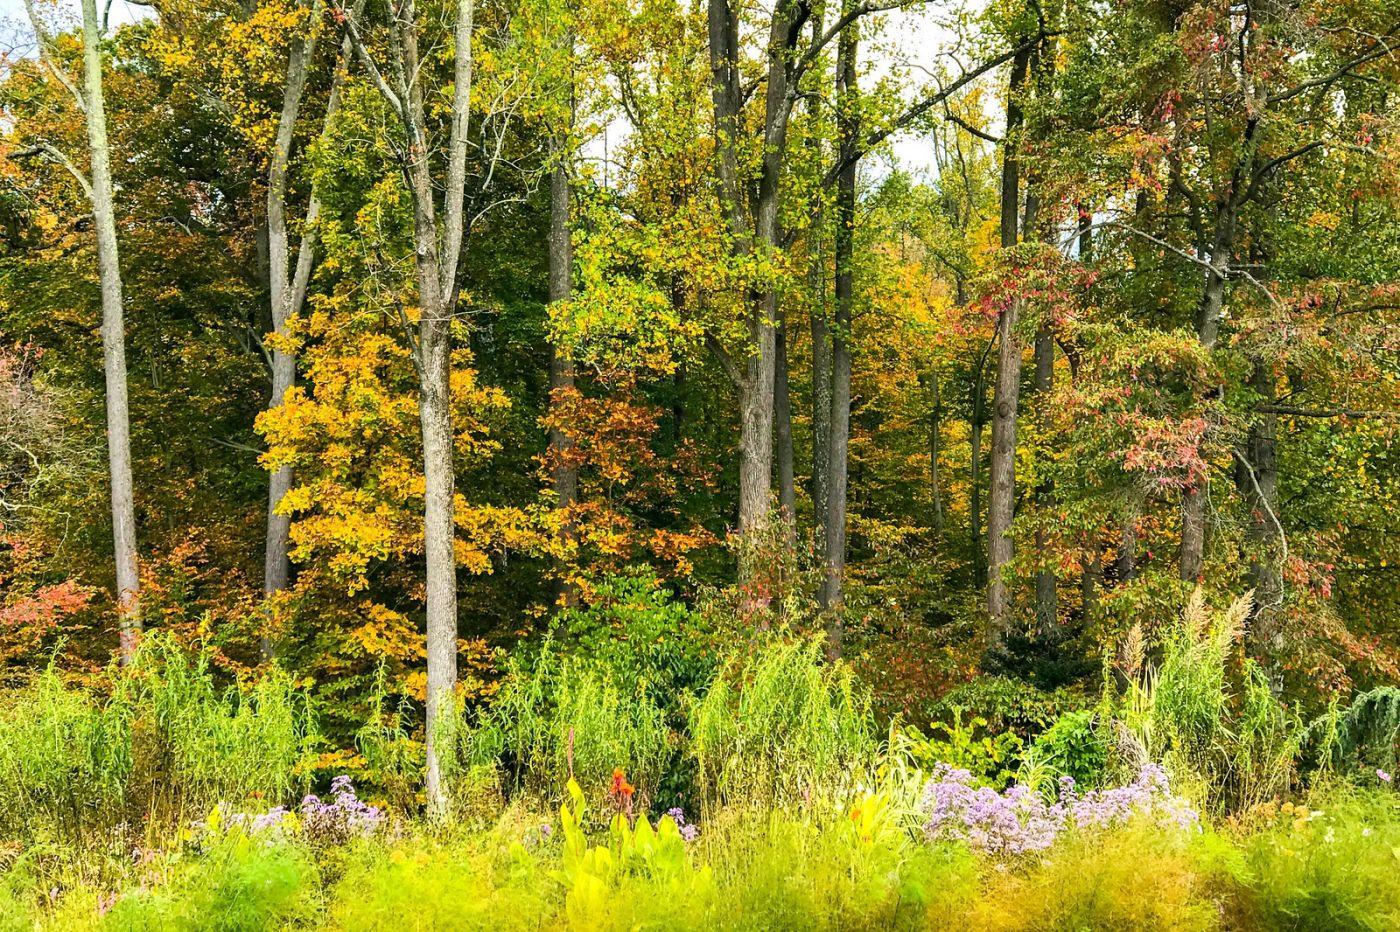 Chanticleer花园,季季有色彩_图1-6